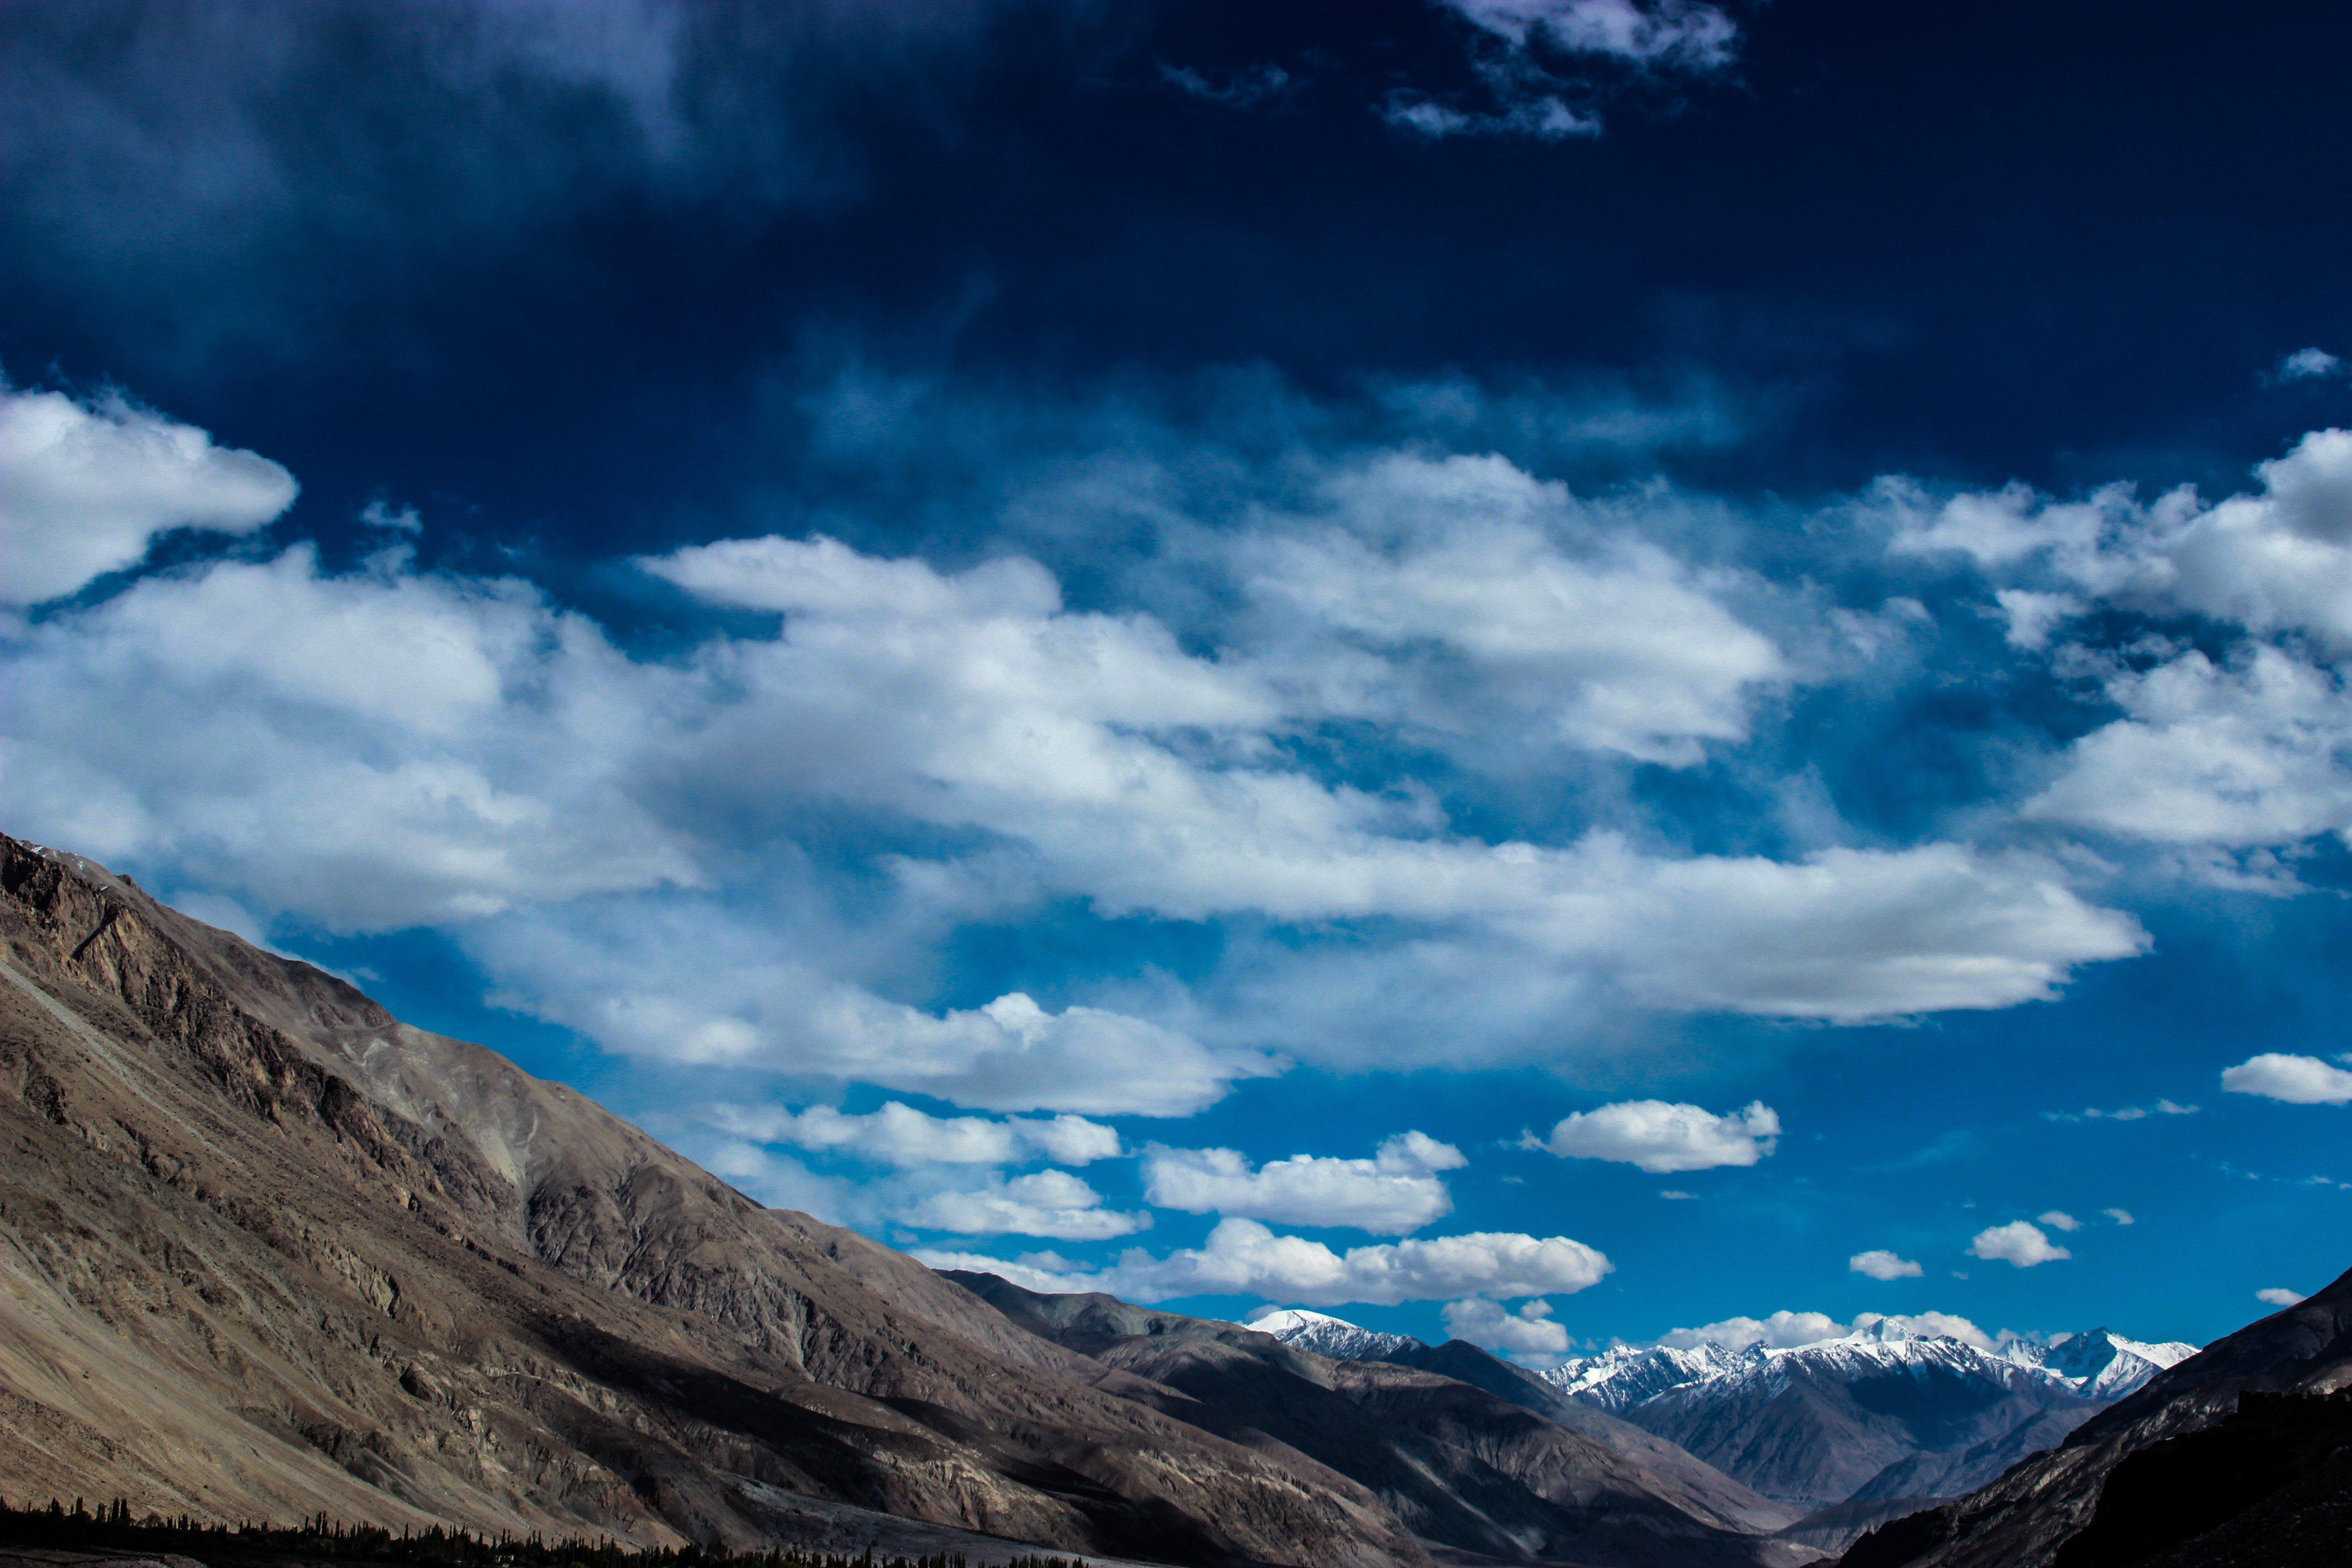 mountains sky light clouds - photo #6